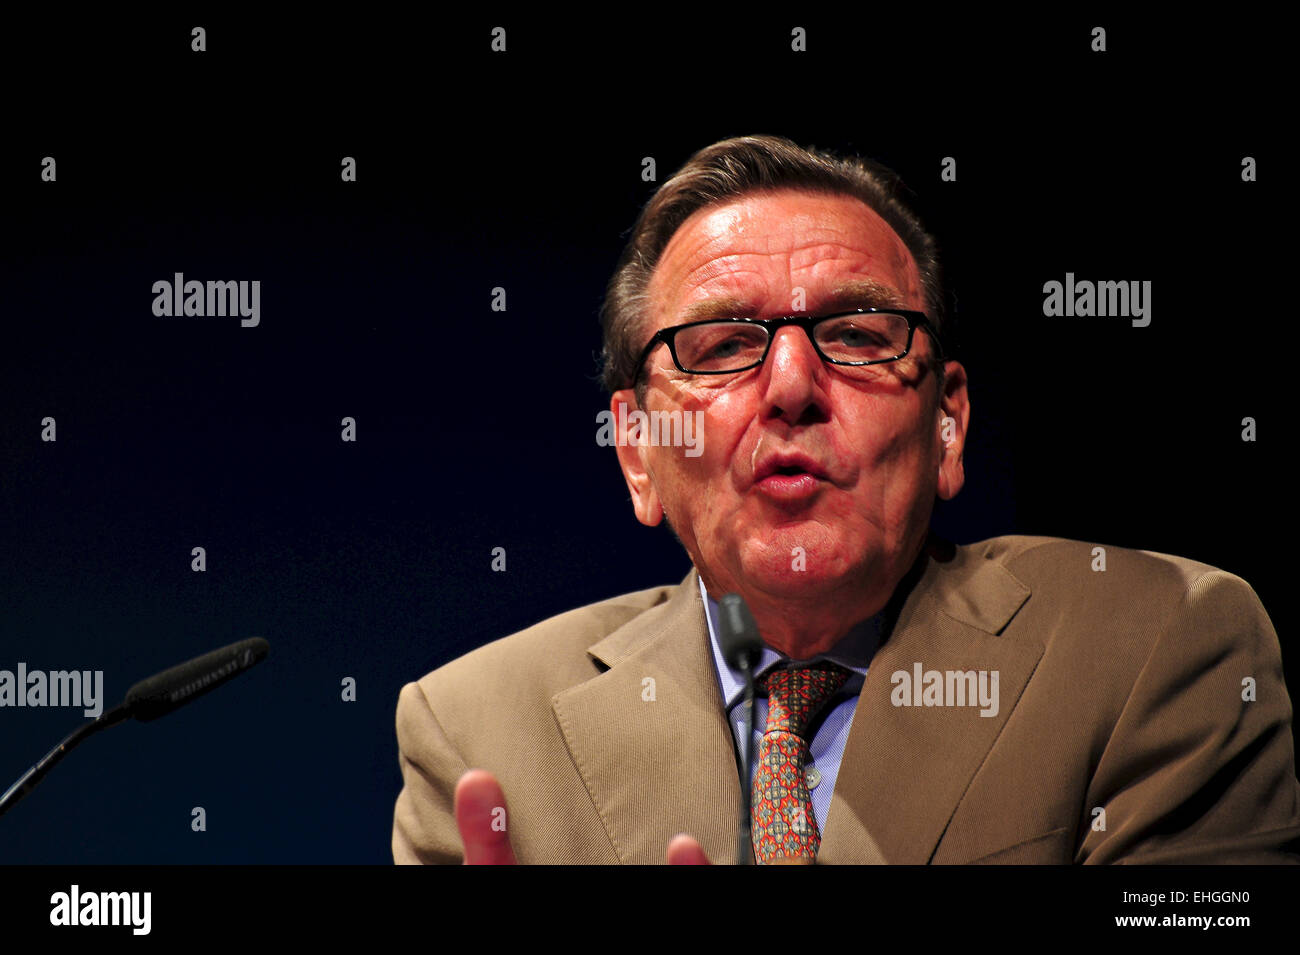 Ex-Bundeskanzler Gerhard Schröder - Stock Image